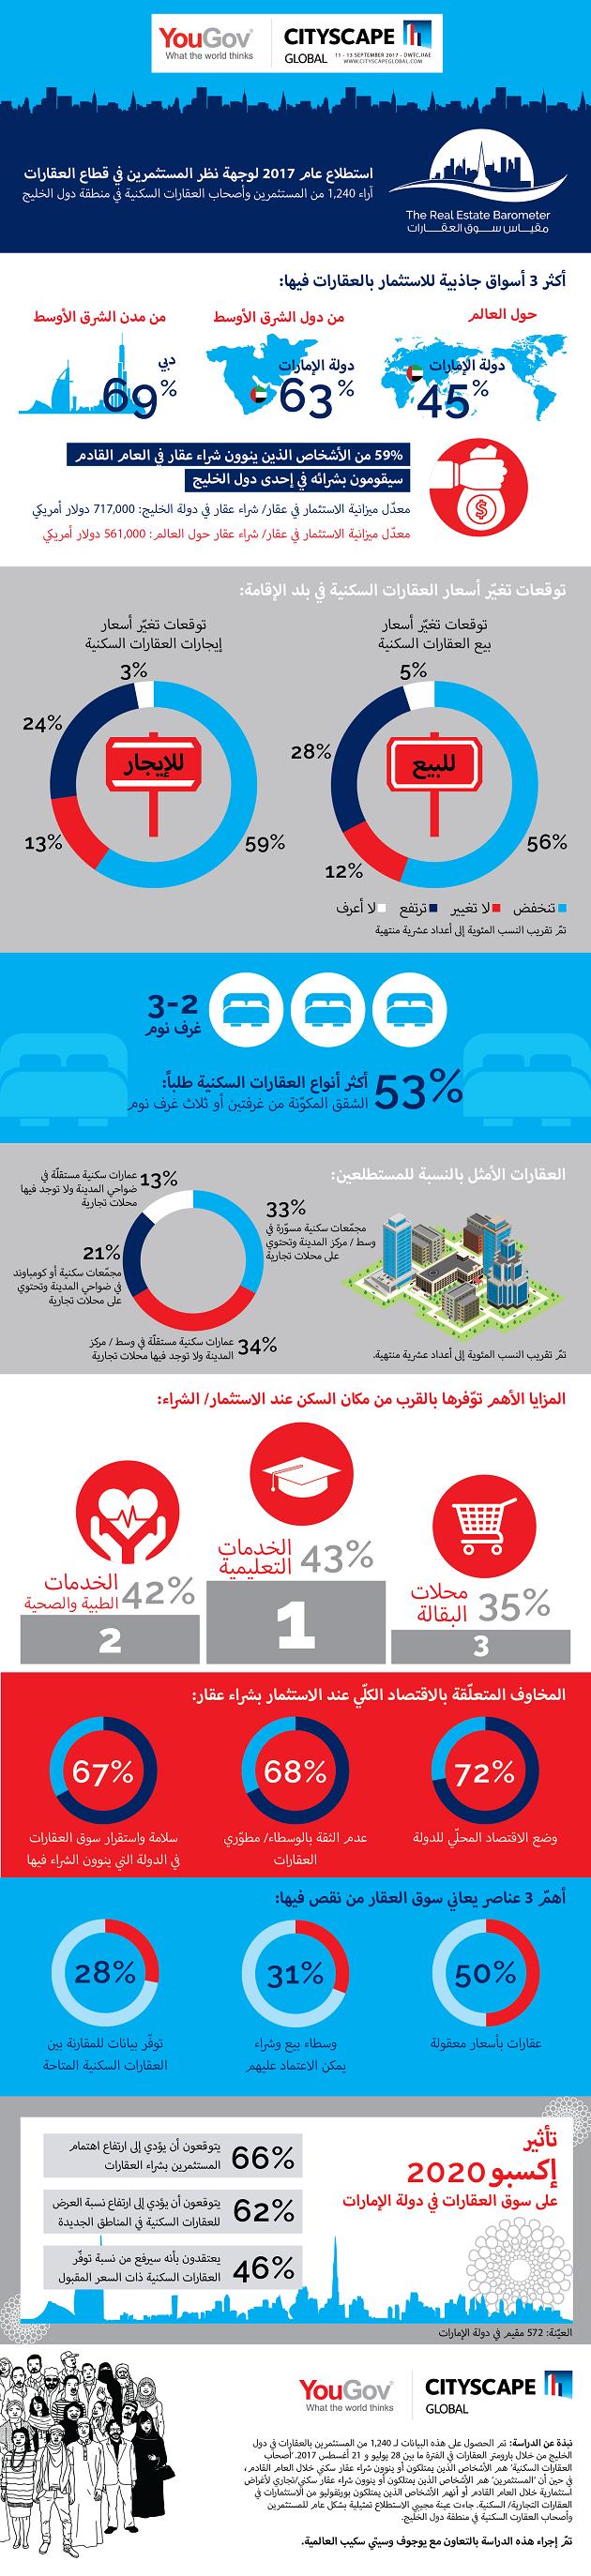 Infographic: GCC Real Estate Investor Sentiment